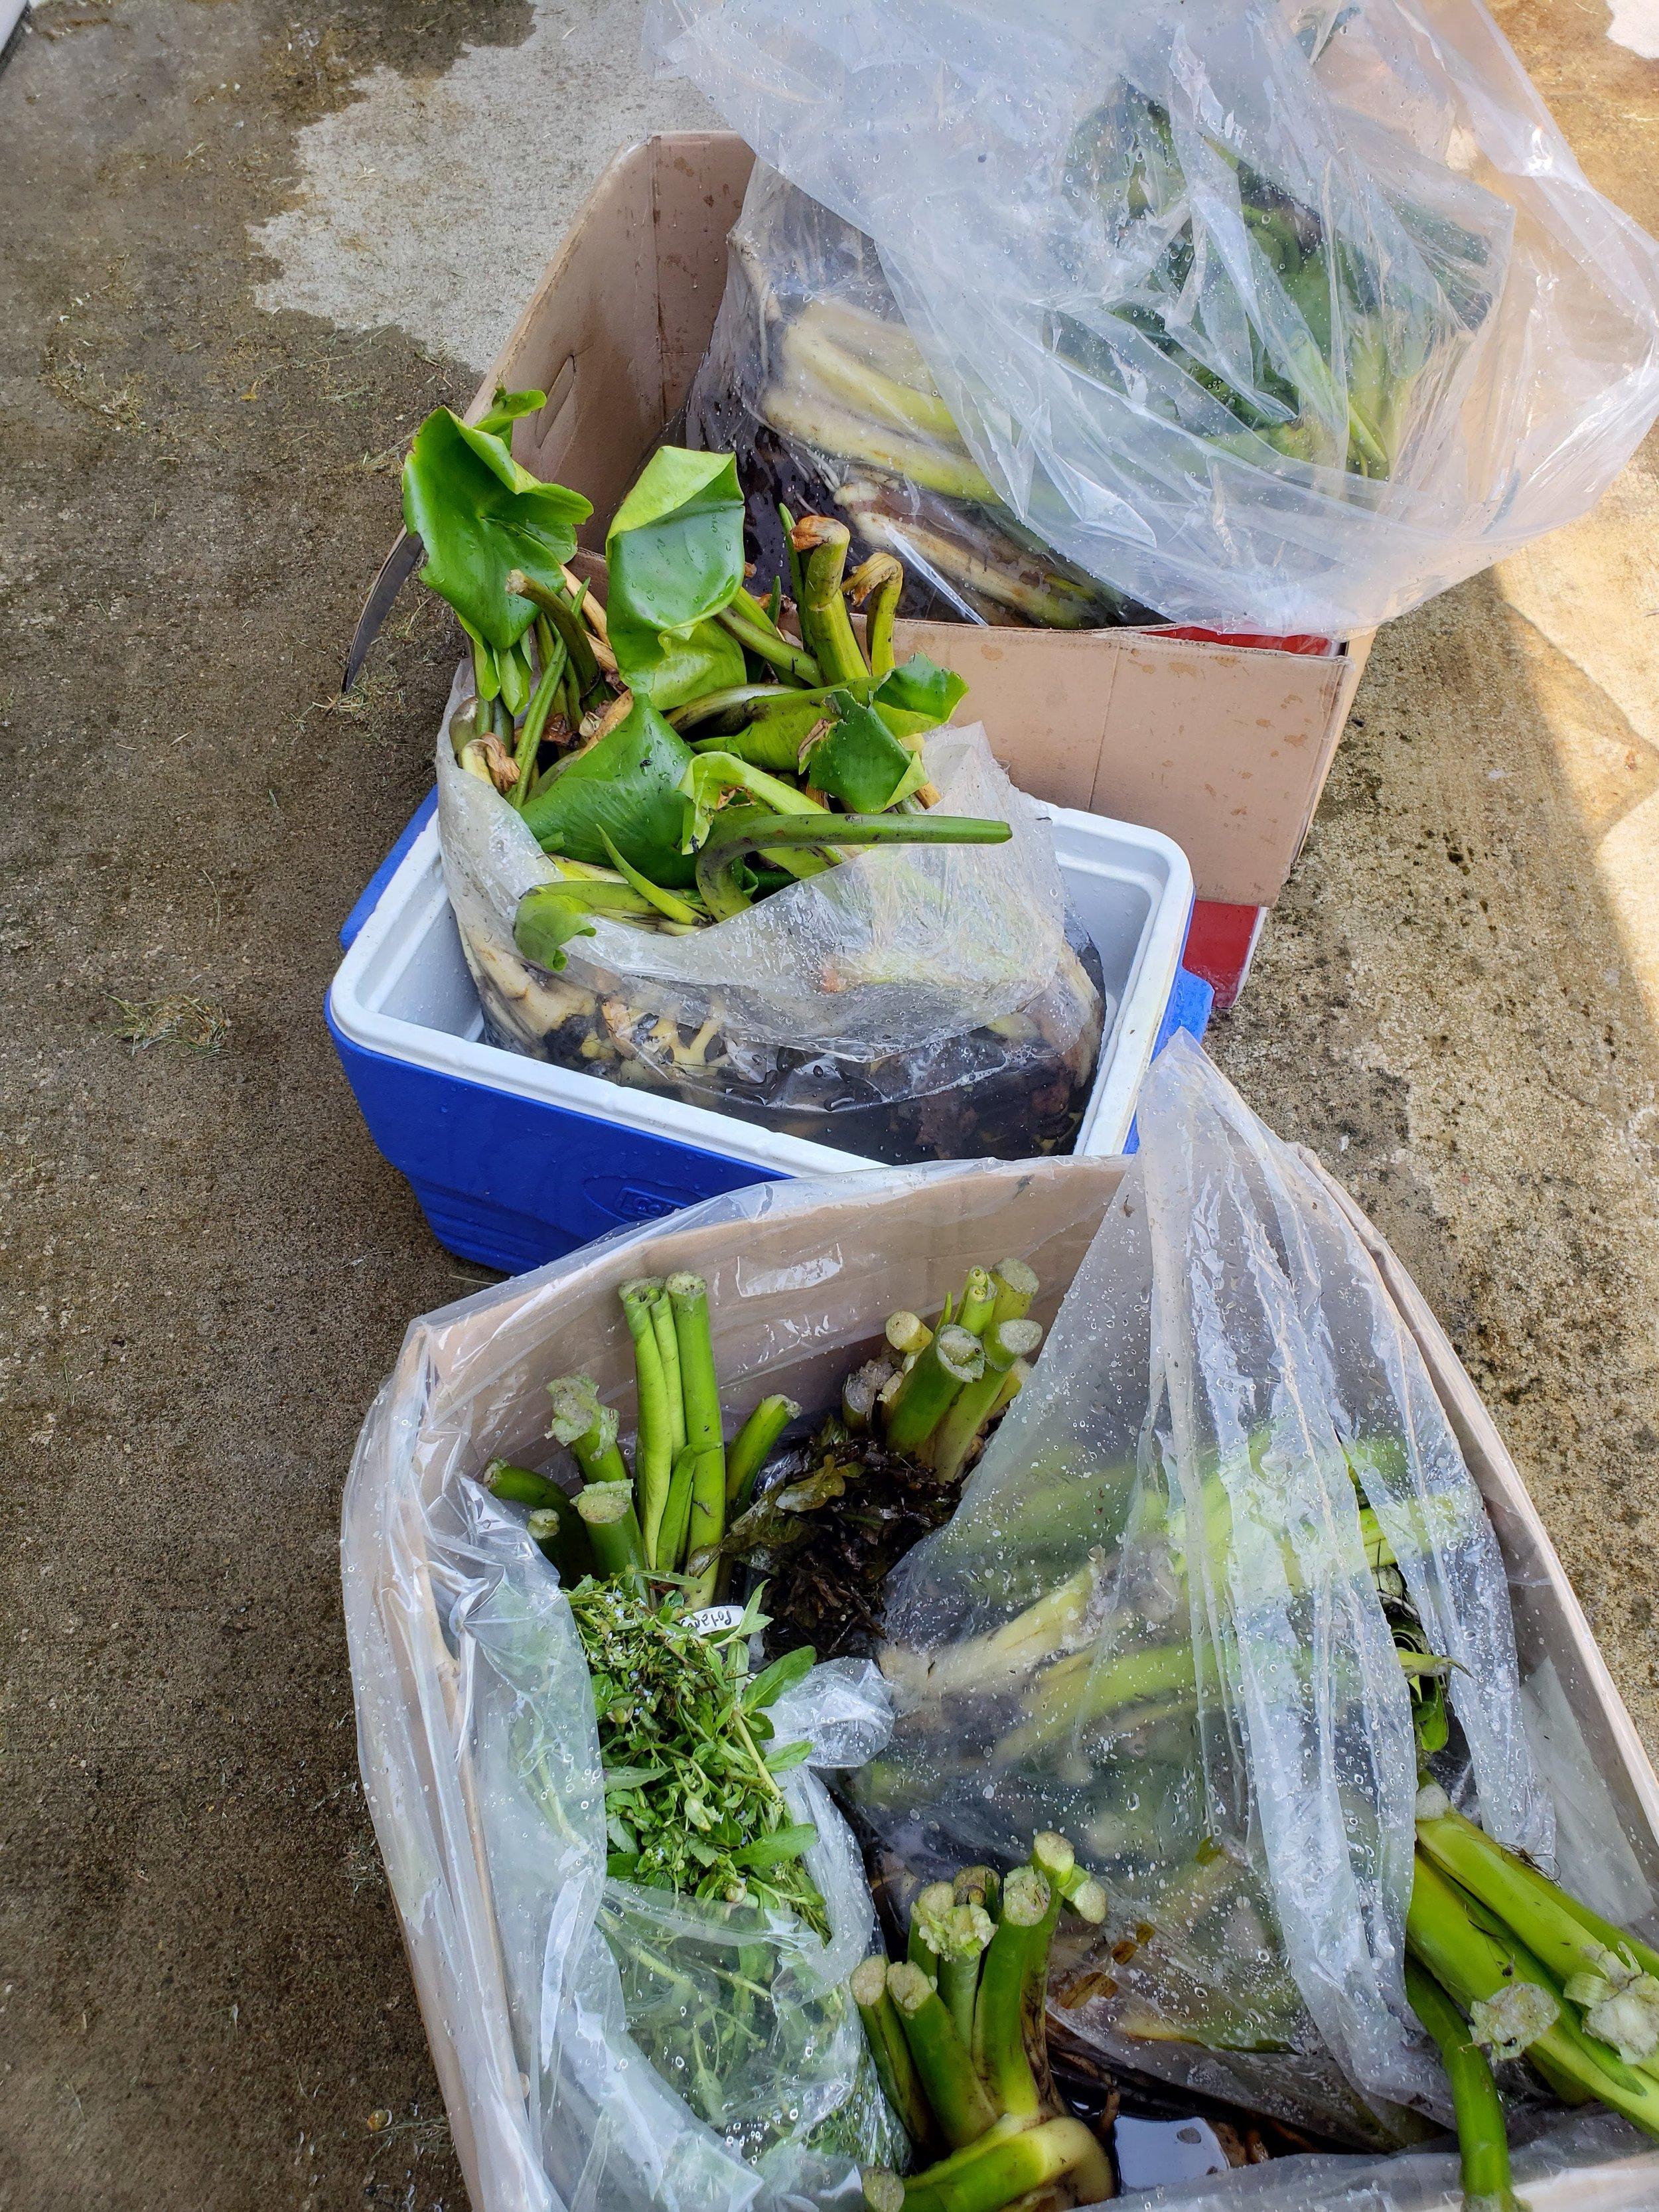 Aquatic plants arrive from Balance Restoration Nursery, Lorane, OR